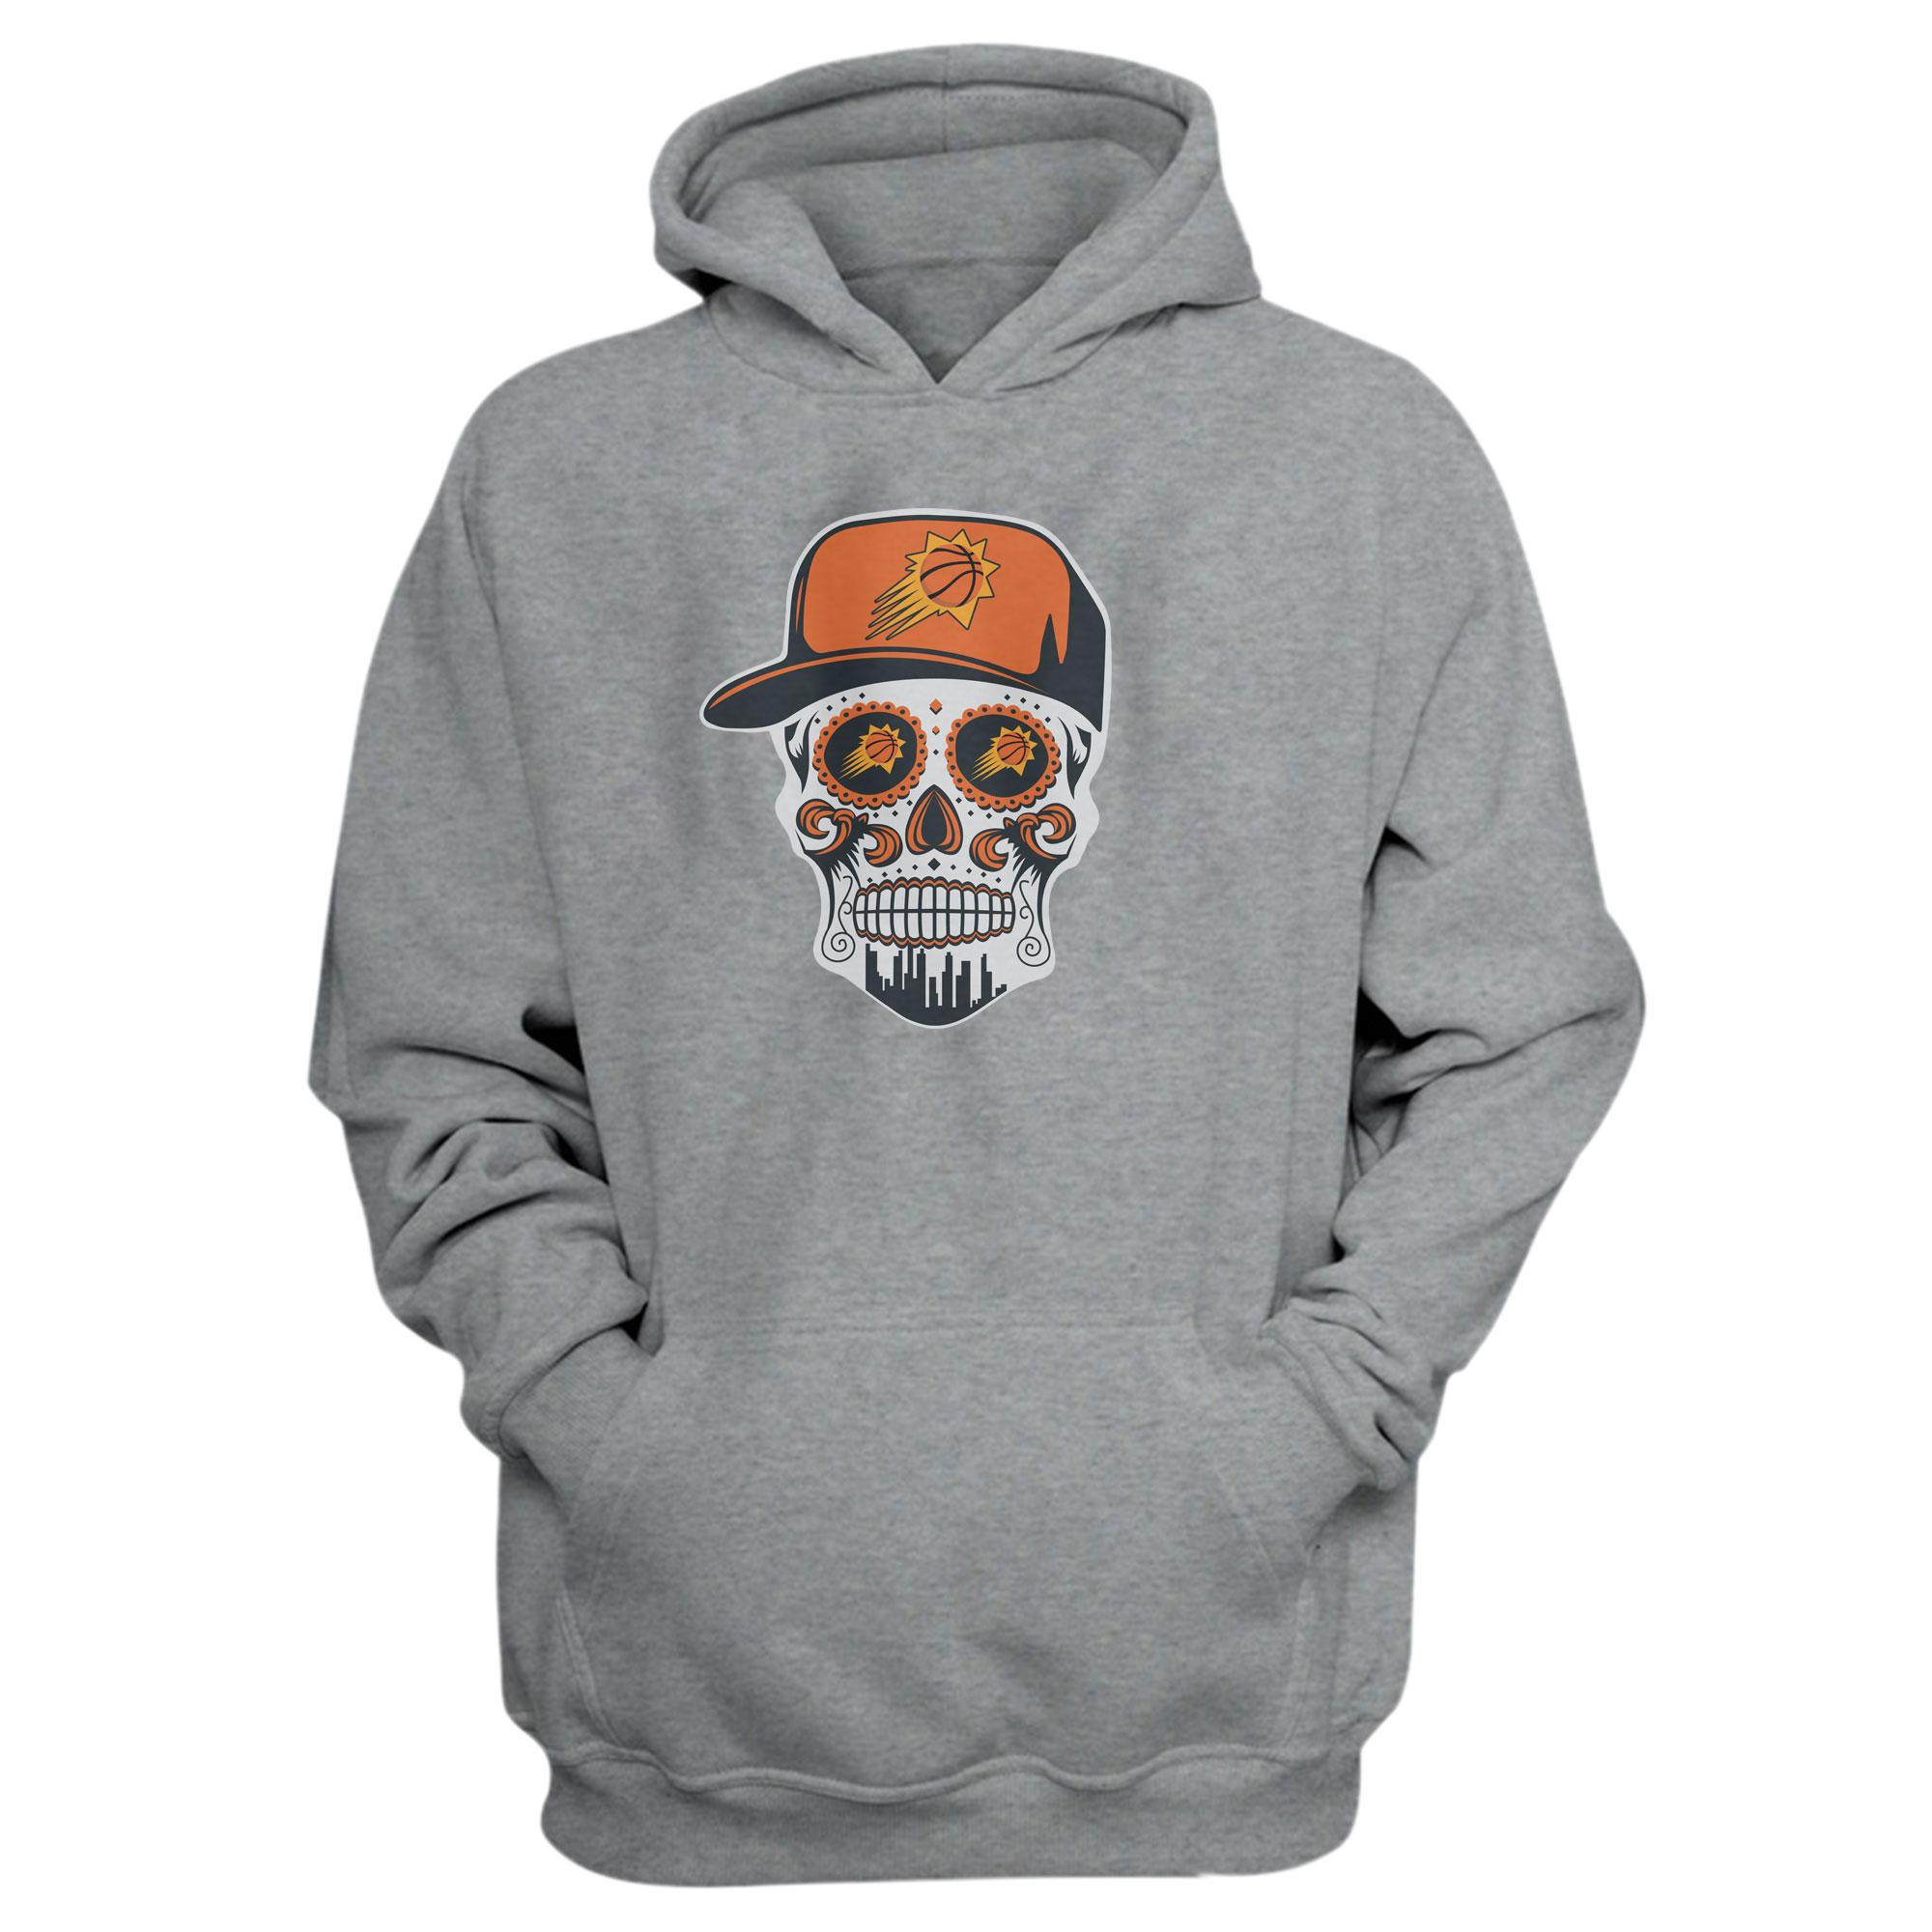 Phoenix Skull Hoodie (HD-GRY-NP-461-NBA-PHO-PHO-SKULL)